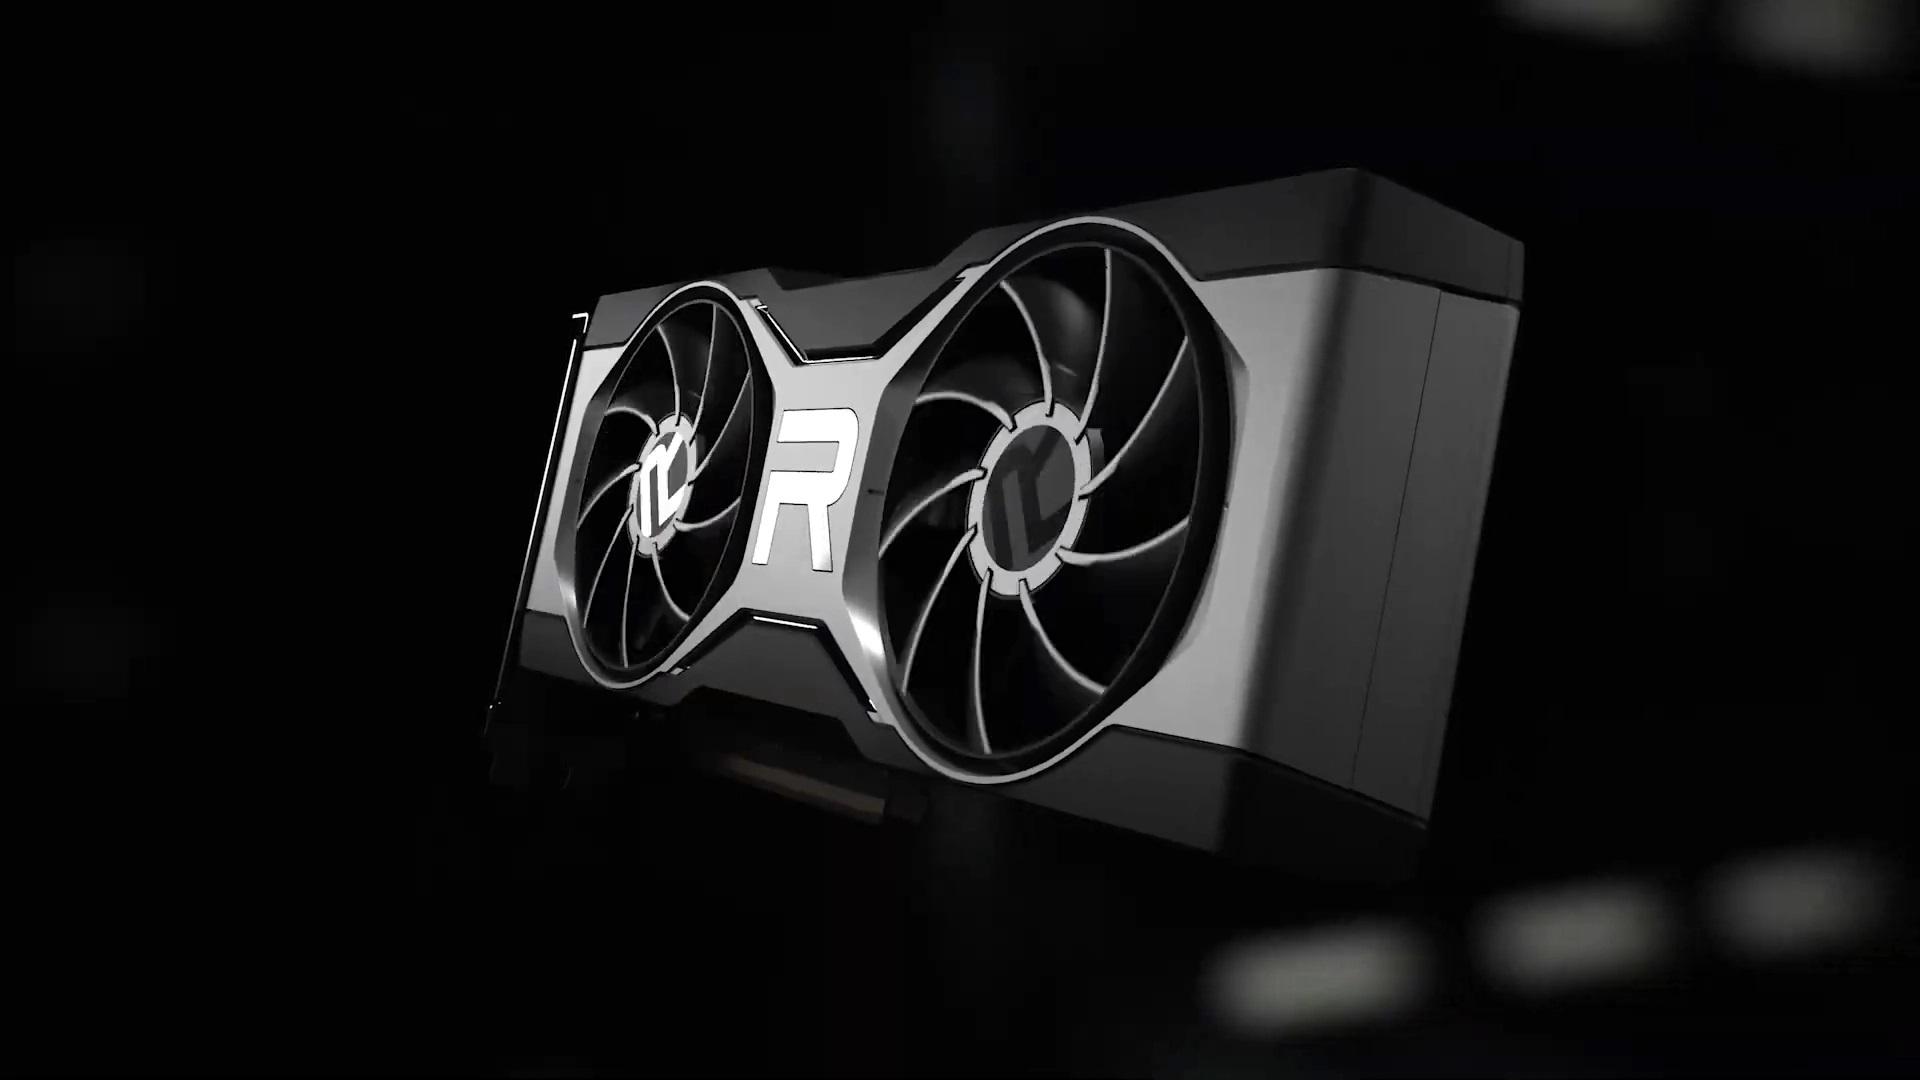 AMD Radeon RX 6600 XT получает 2048 ядер, RX 6600 - 1792 ядра